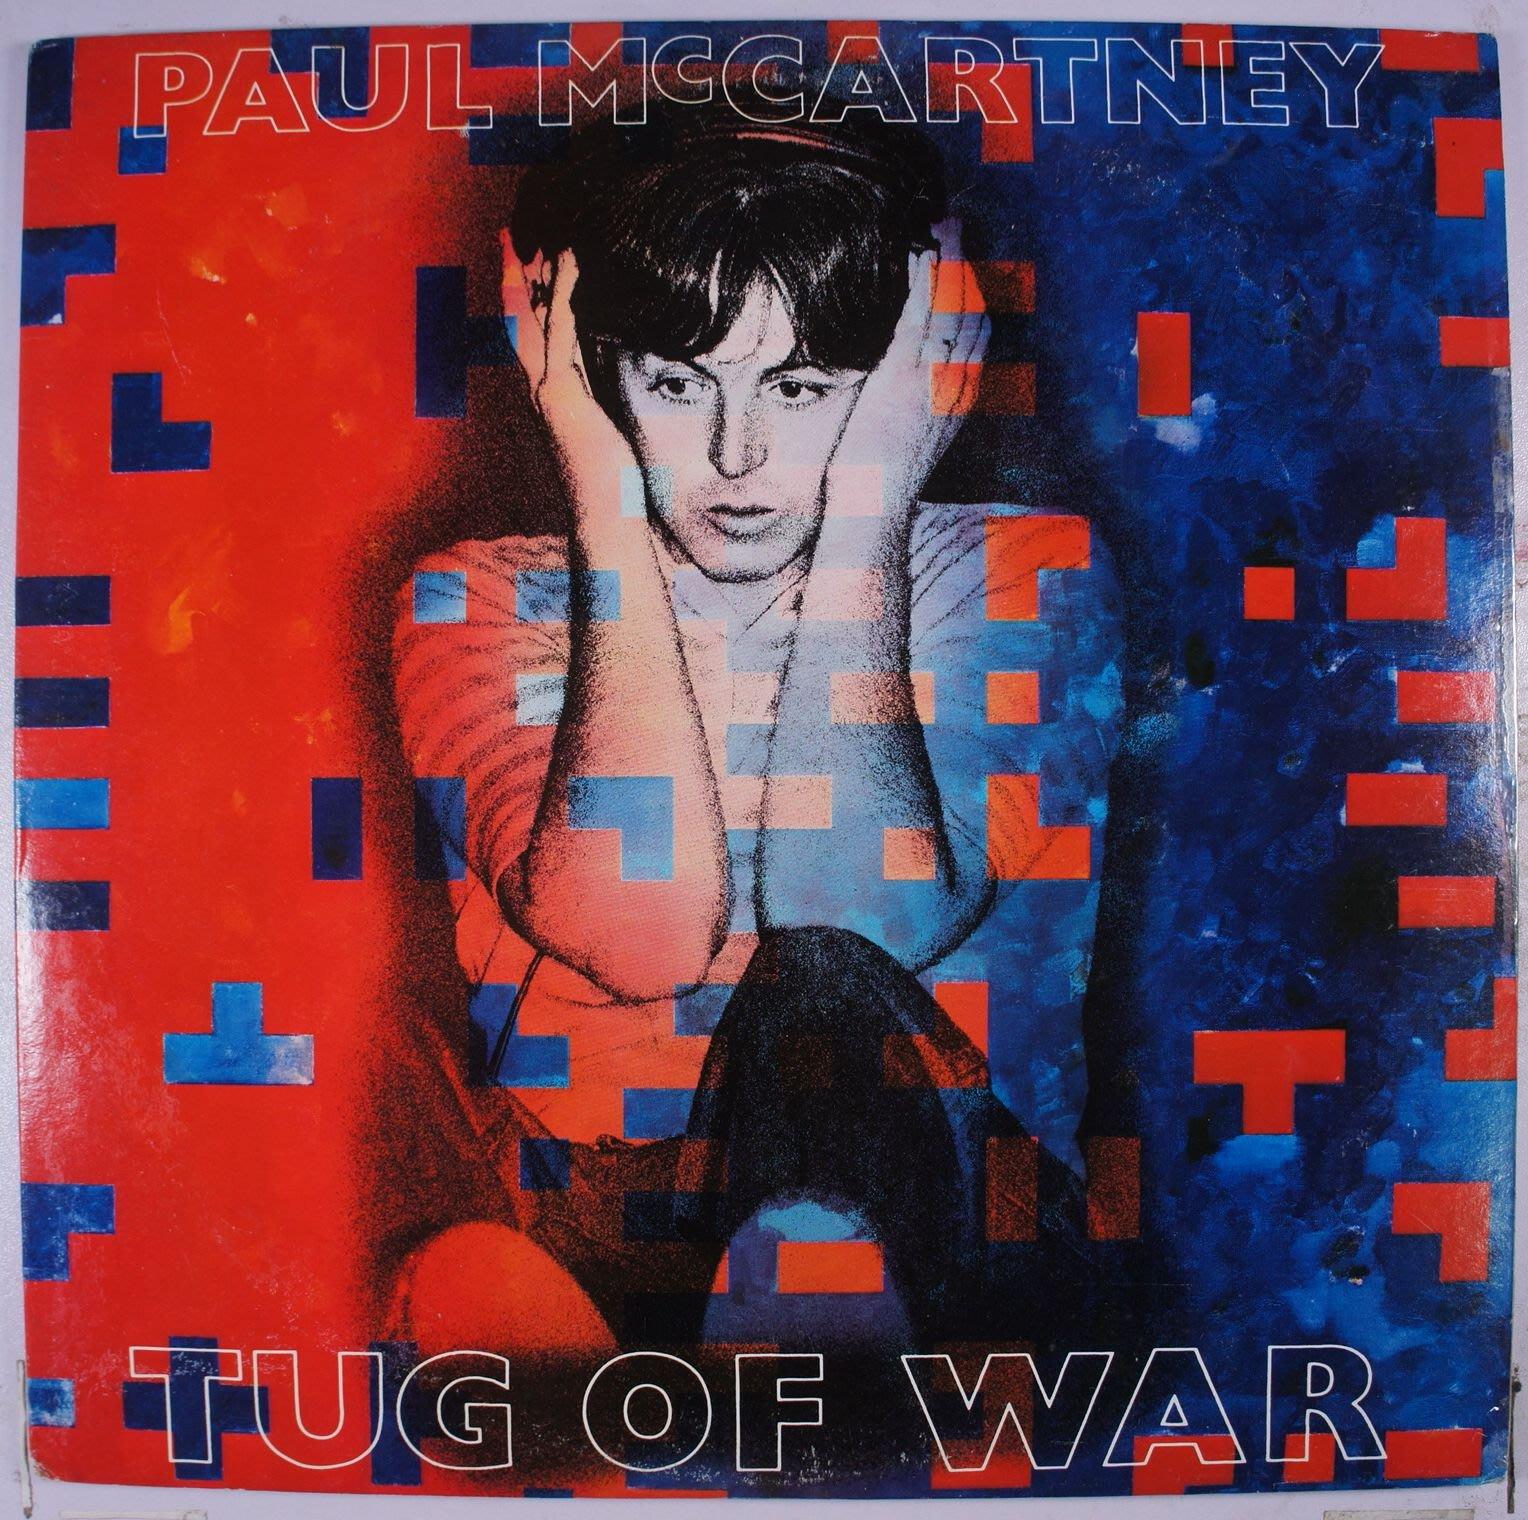 《二手美版黑膠》Paul McCartney - Tug Of War 收錄冠軍曲 Ebony And Ivory